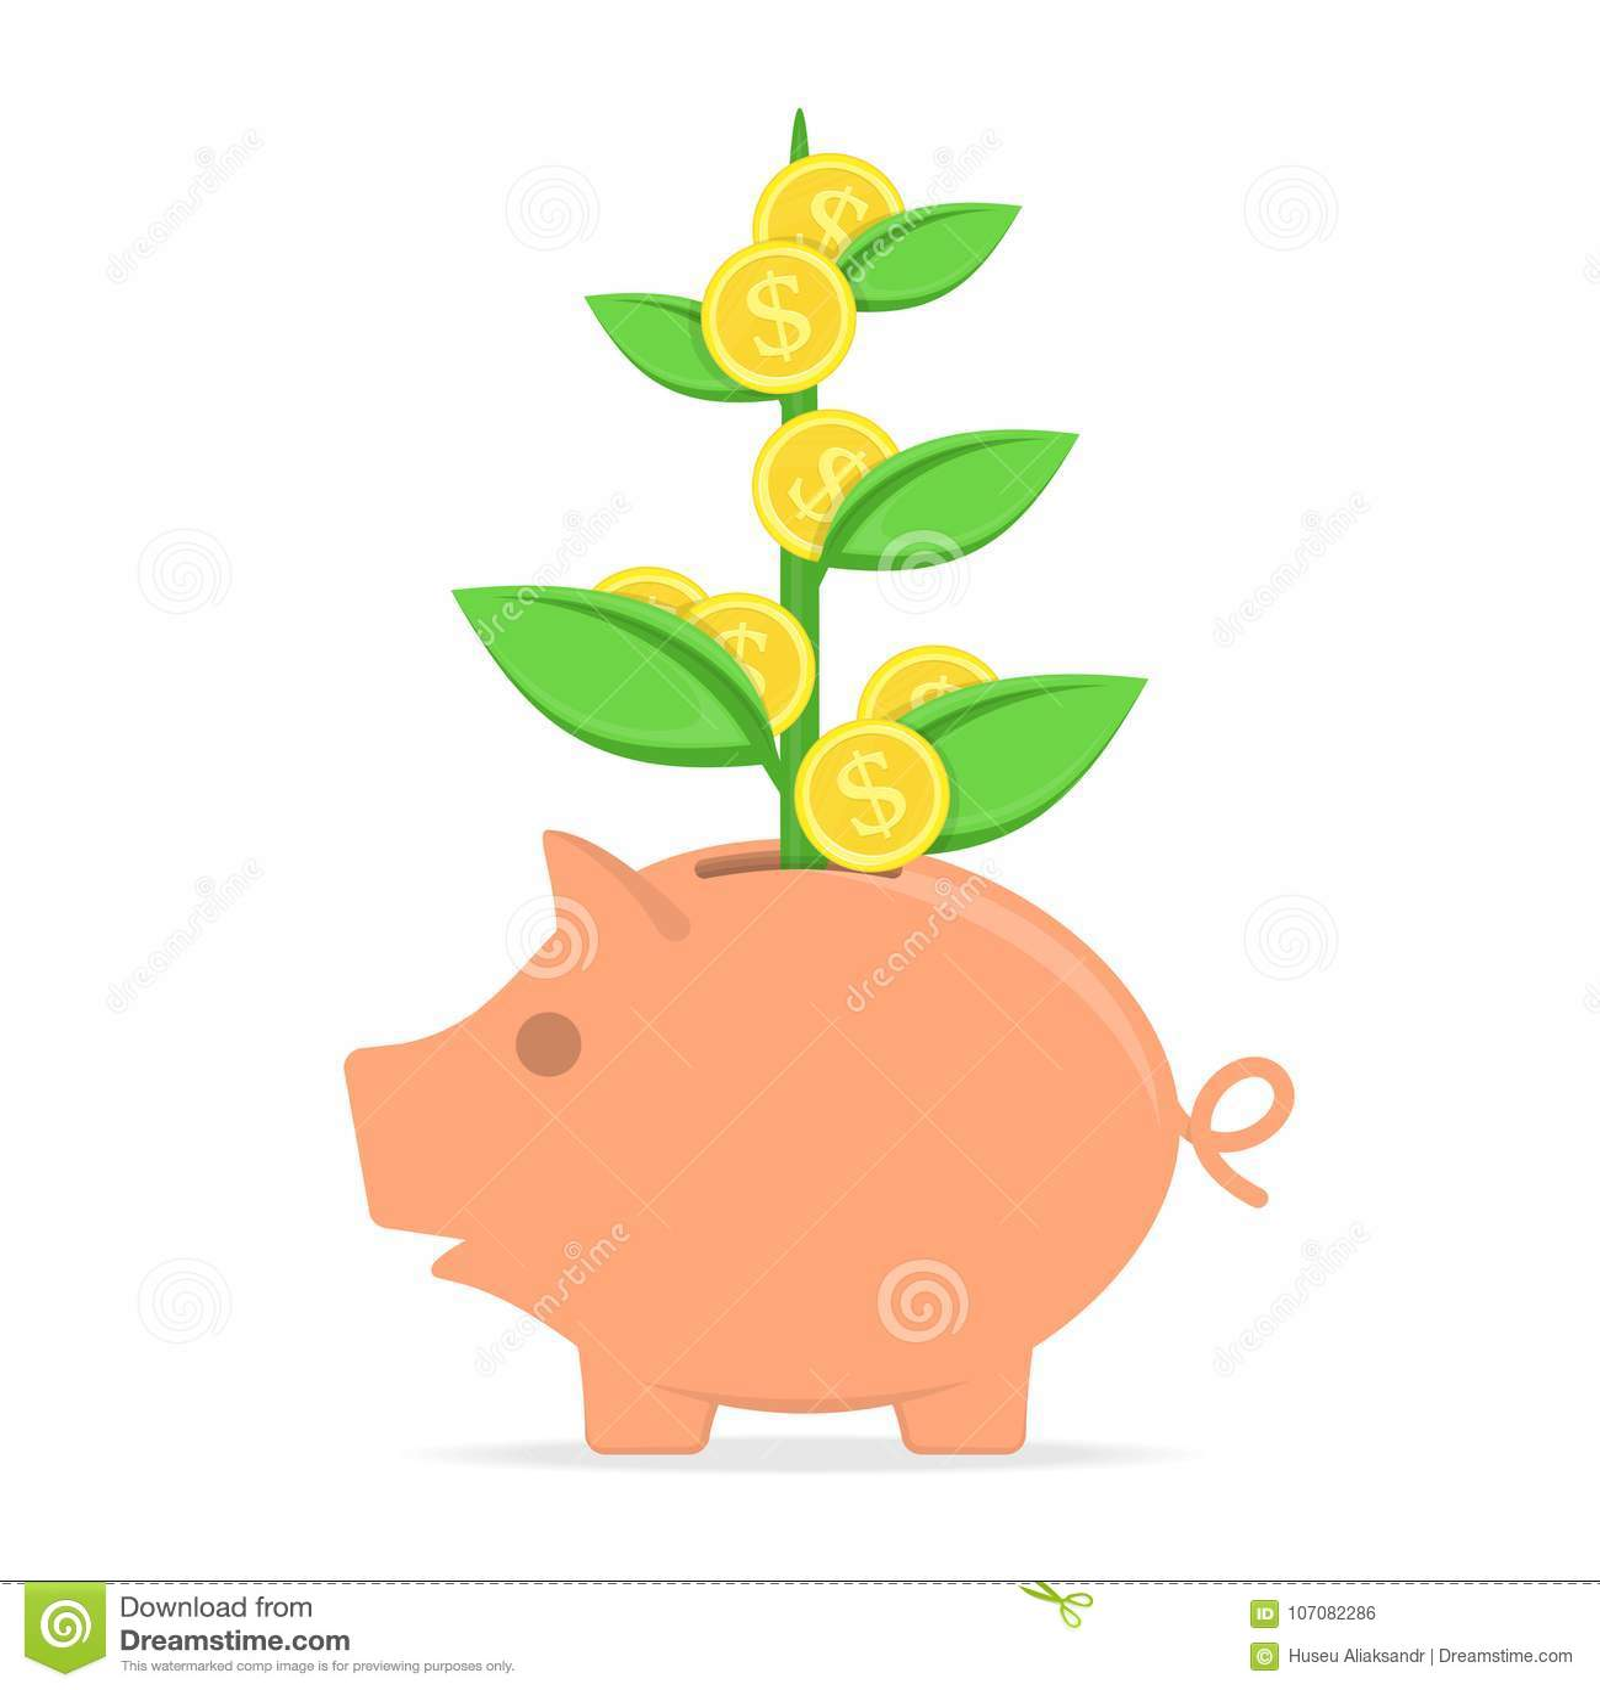 Cartoon Broken Piggy Bank Icon Happy Pig Money Box Without